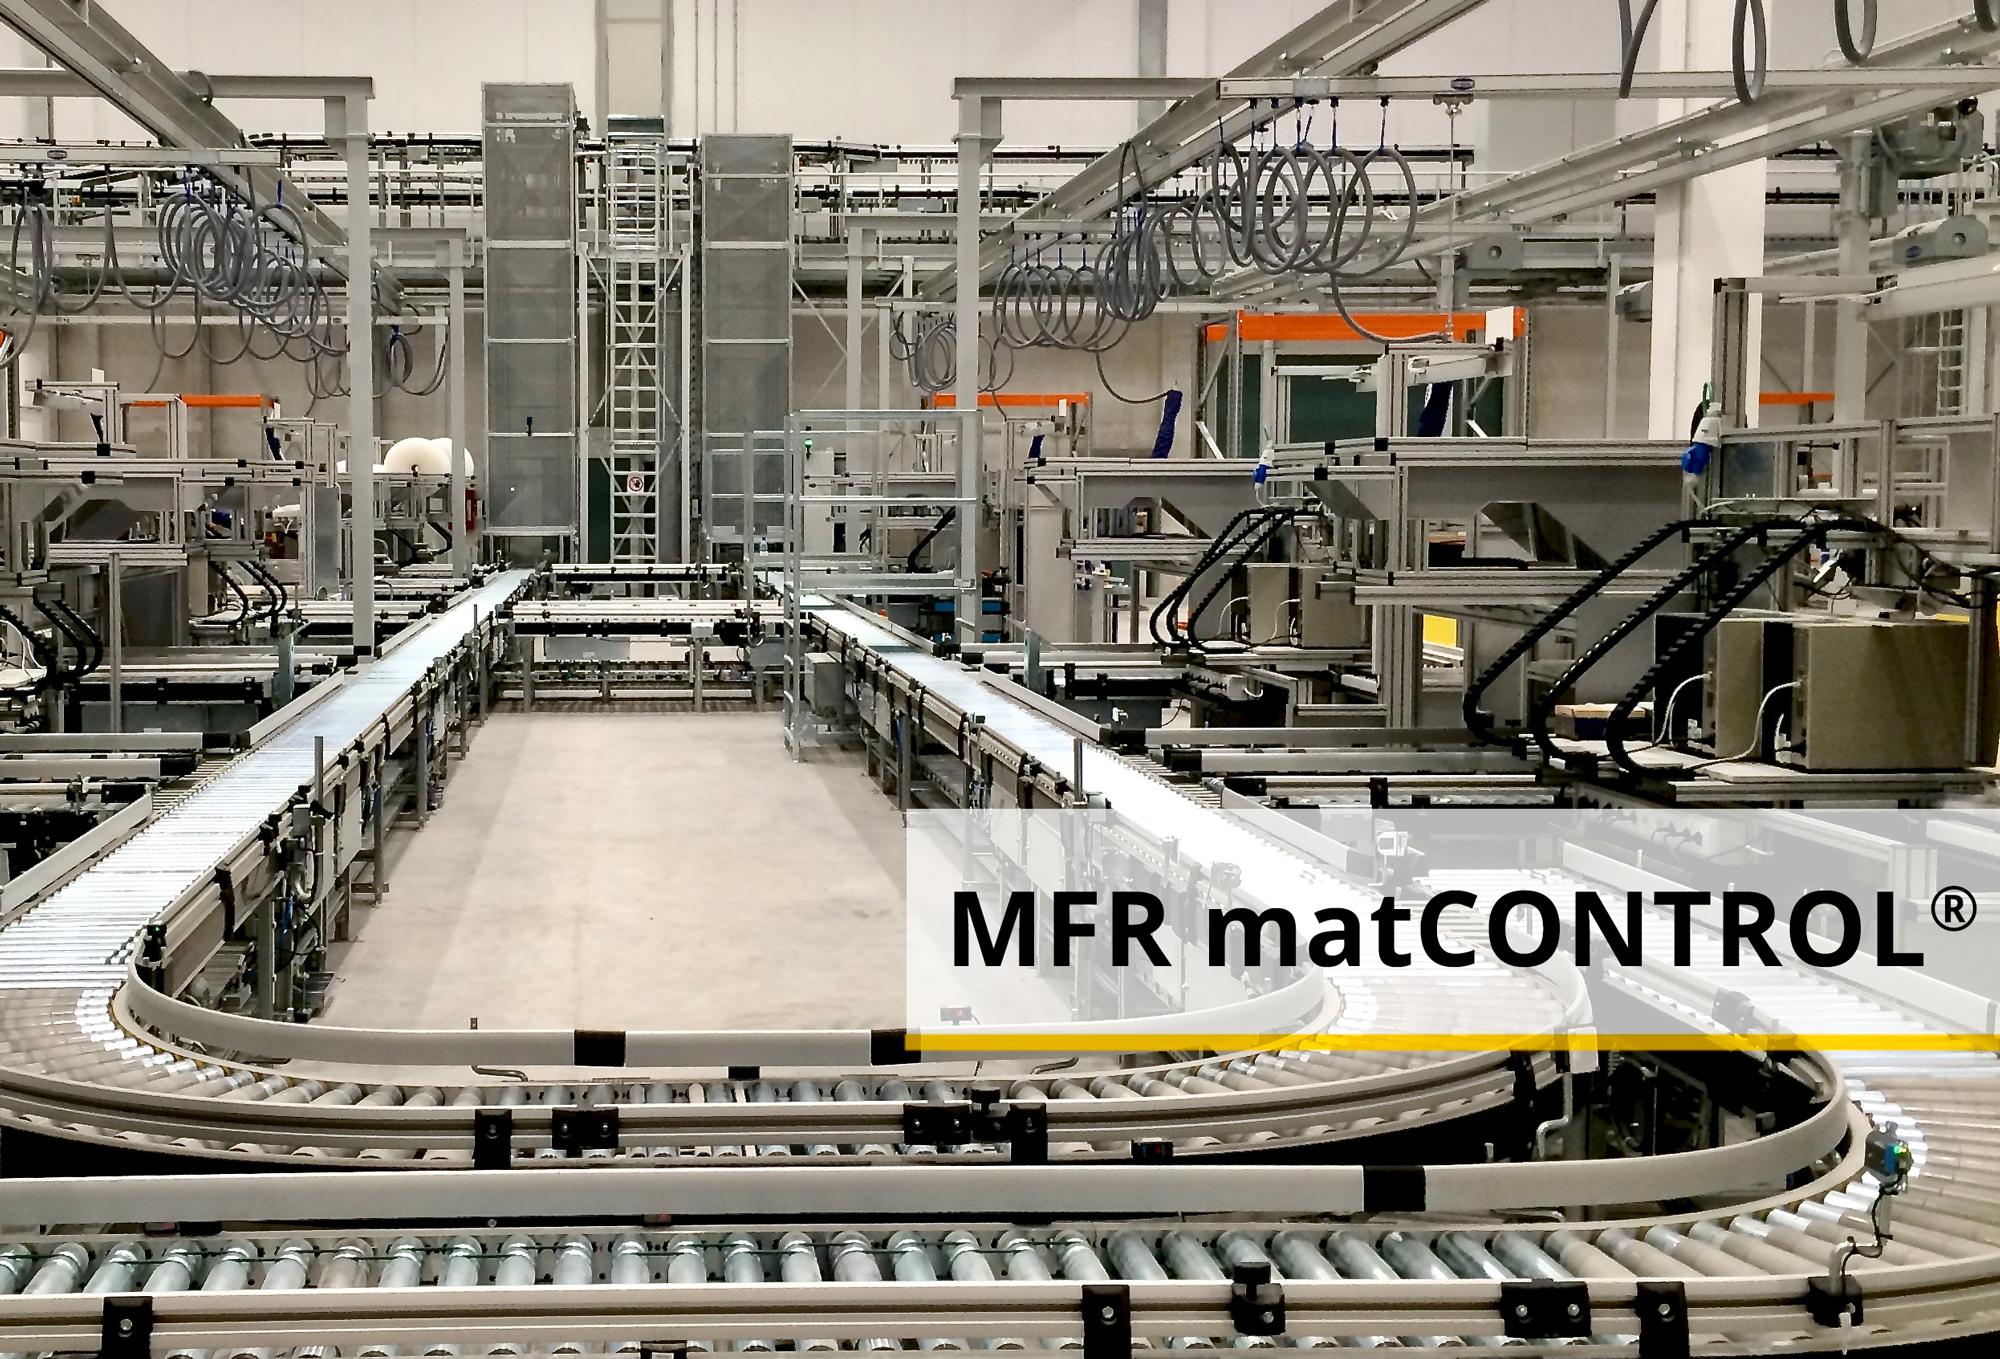 MFR Matcontrol